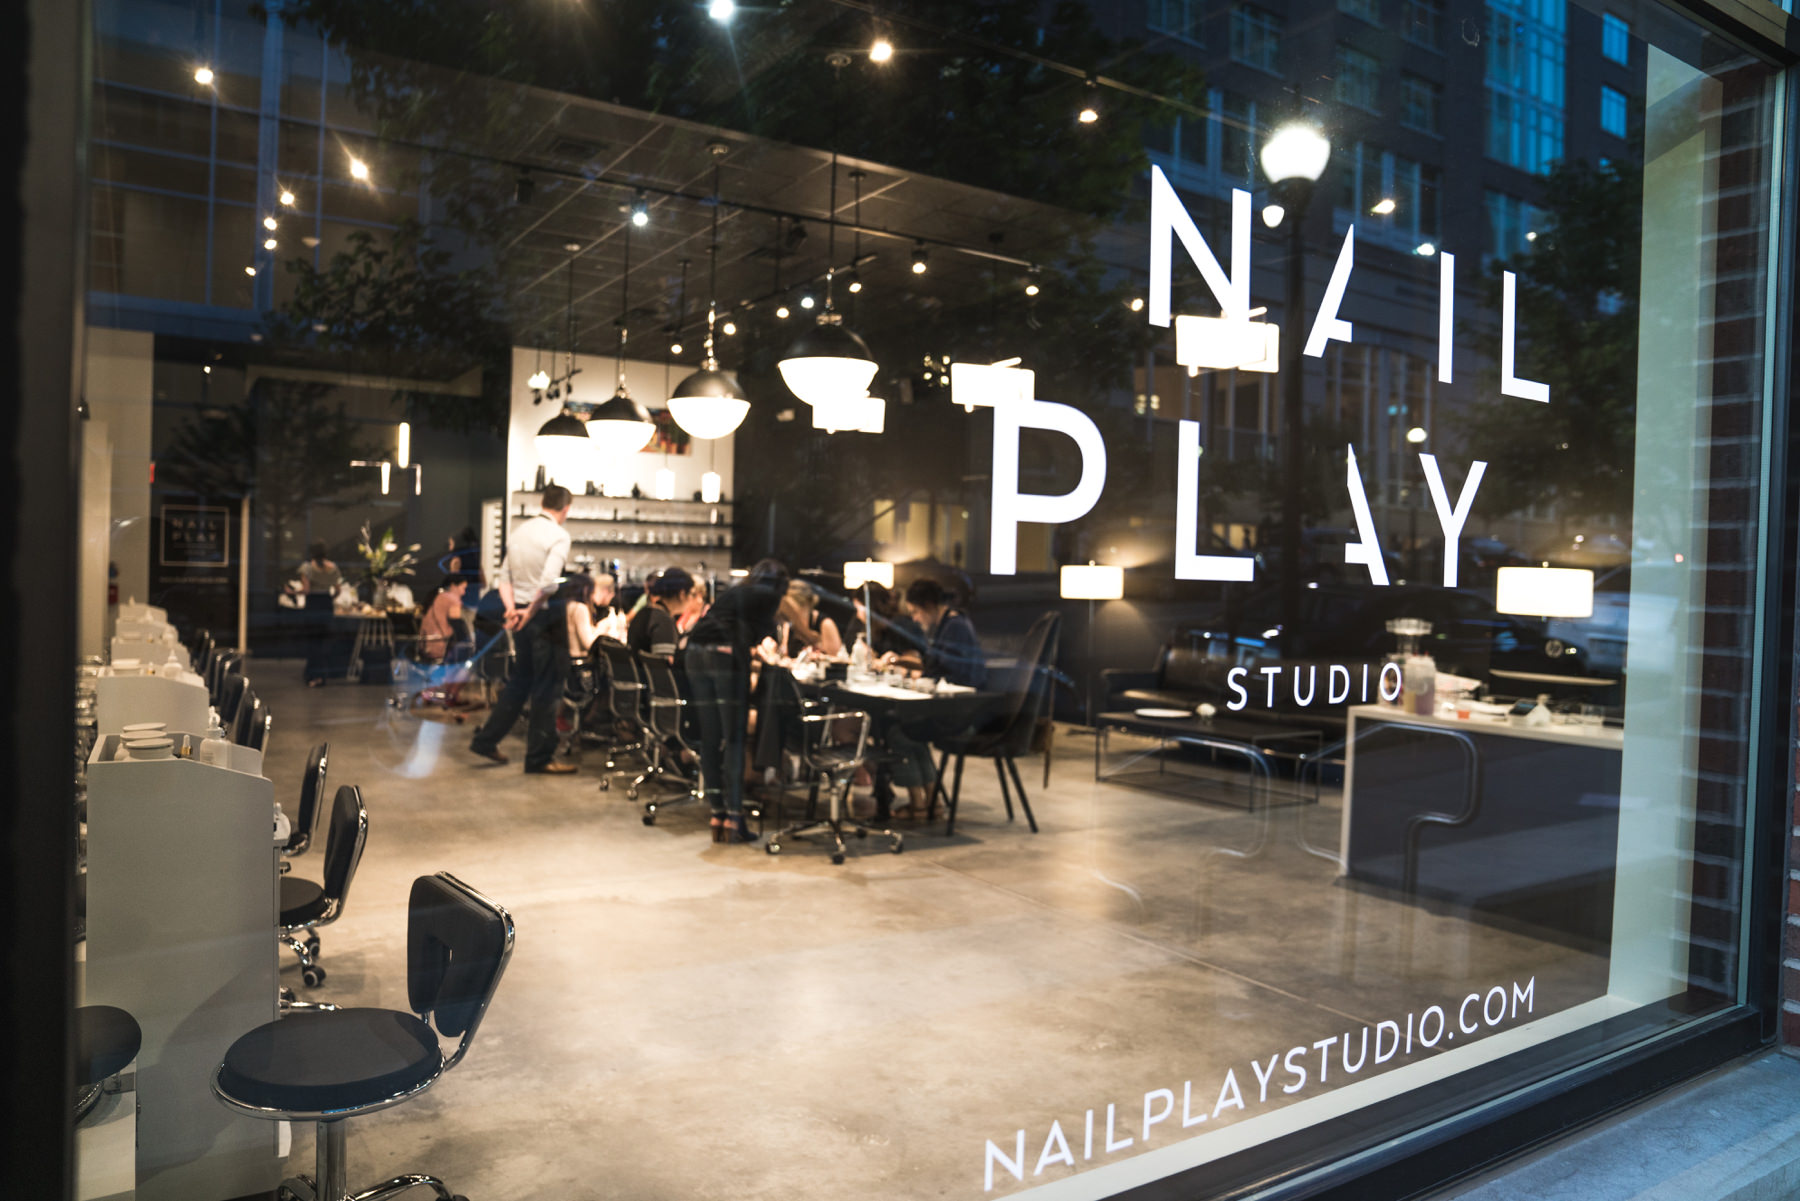 The Nailplay Studio